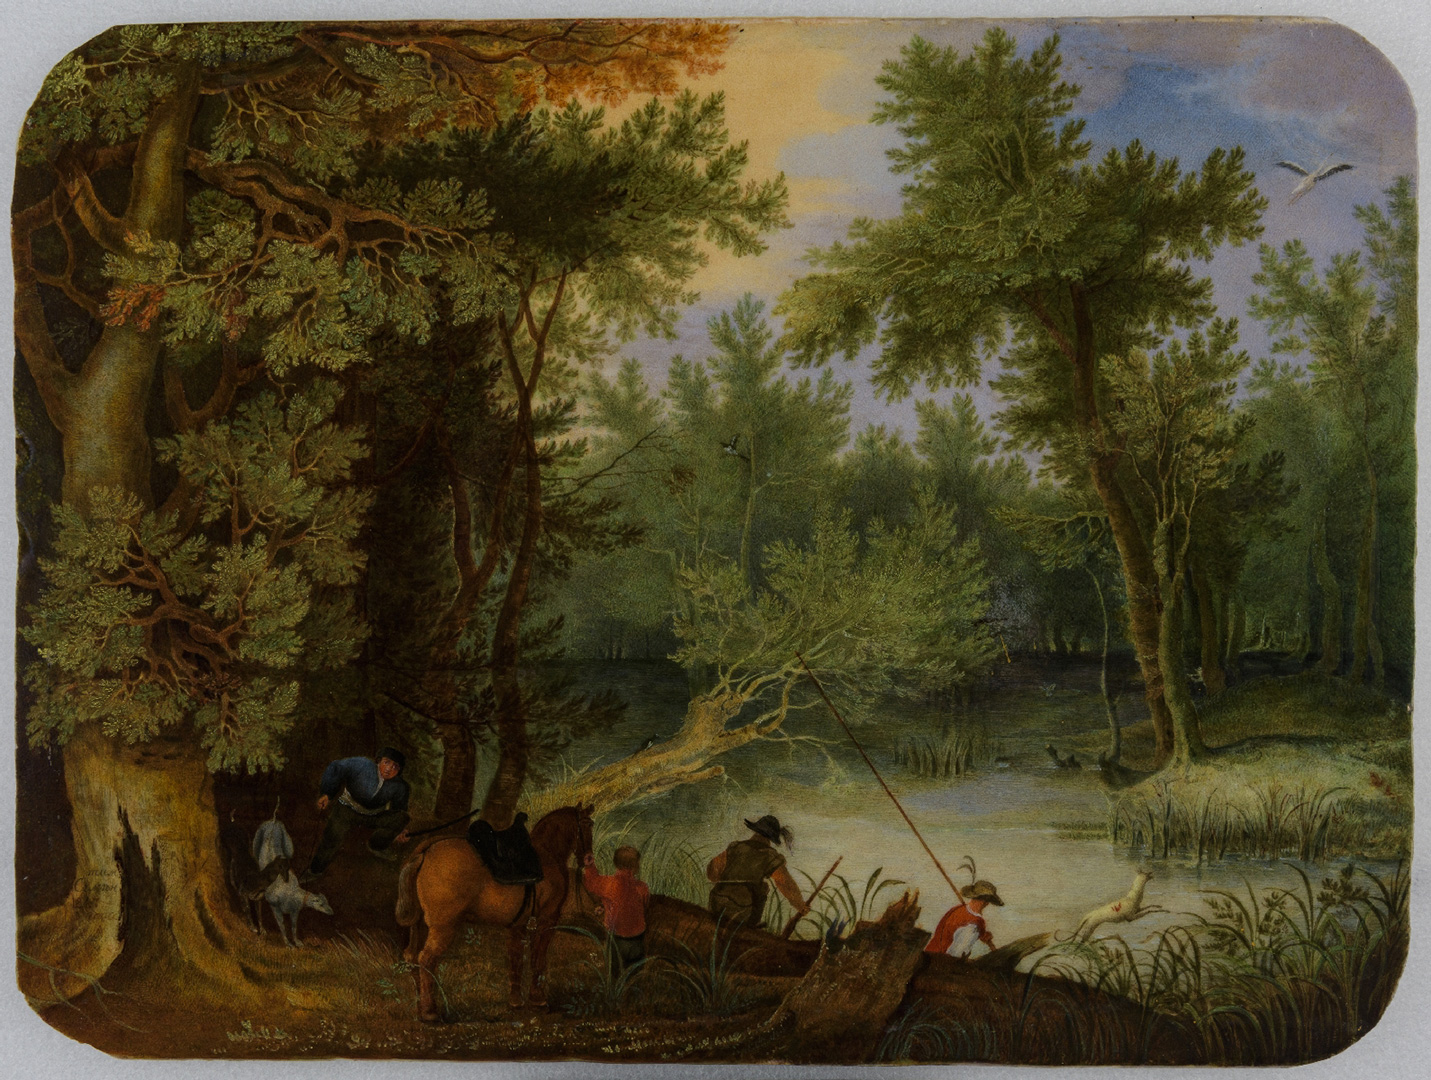 Пласт «Охотники в лесу» 1847 по живописному оригиналу неизвестного художника круга Д. Винкбонса (начало XVII века). Роспись Т.К. Семенова